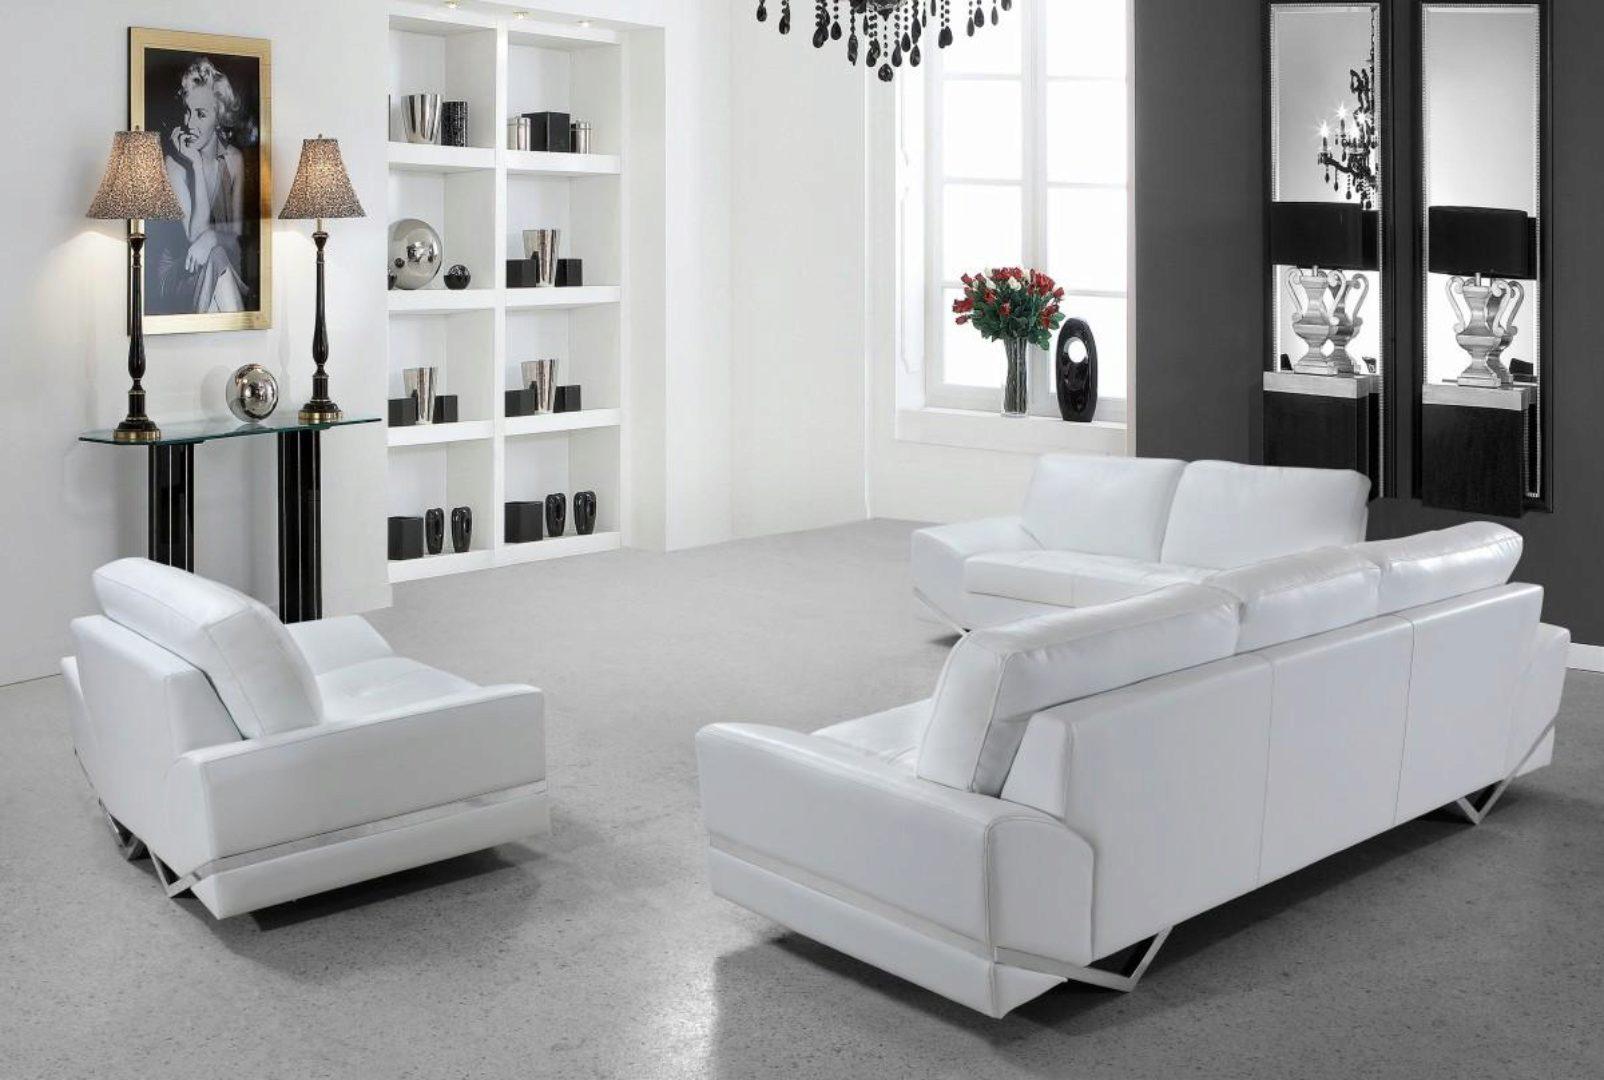 Soflex San Francisco Modern White Leather Sofa Living Room Set 3pcs Contemporary Soflex San Francisco Sofa Set 3